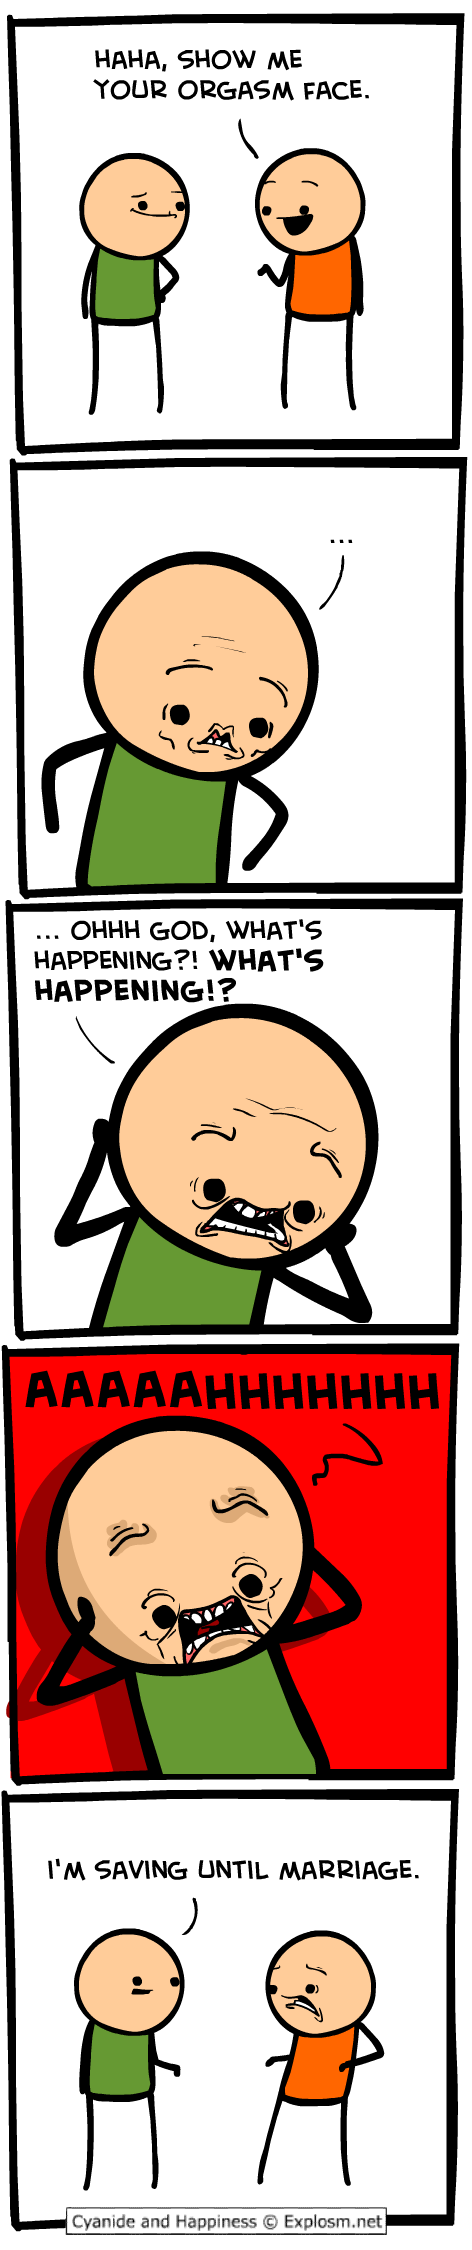 http://files.explosm.net/comics/Dave/savinguntilmarriagebigger.png